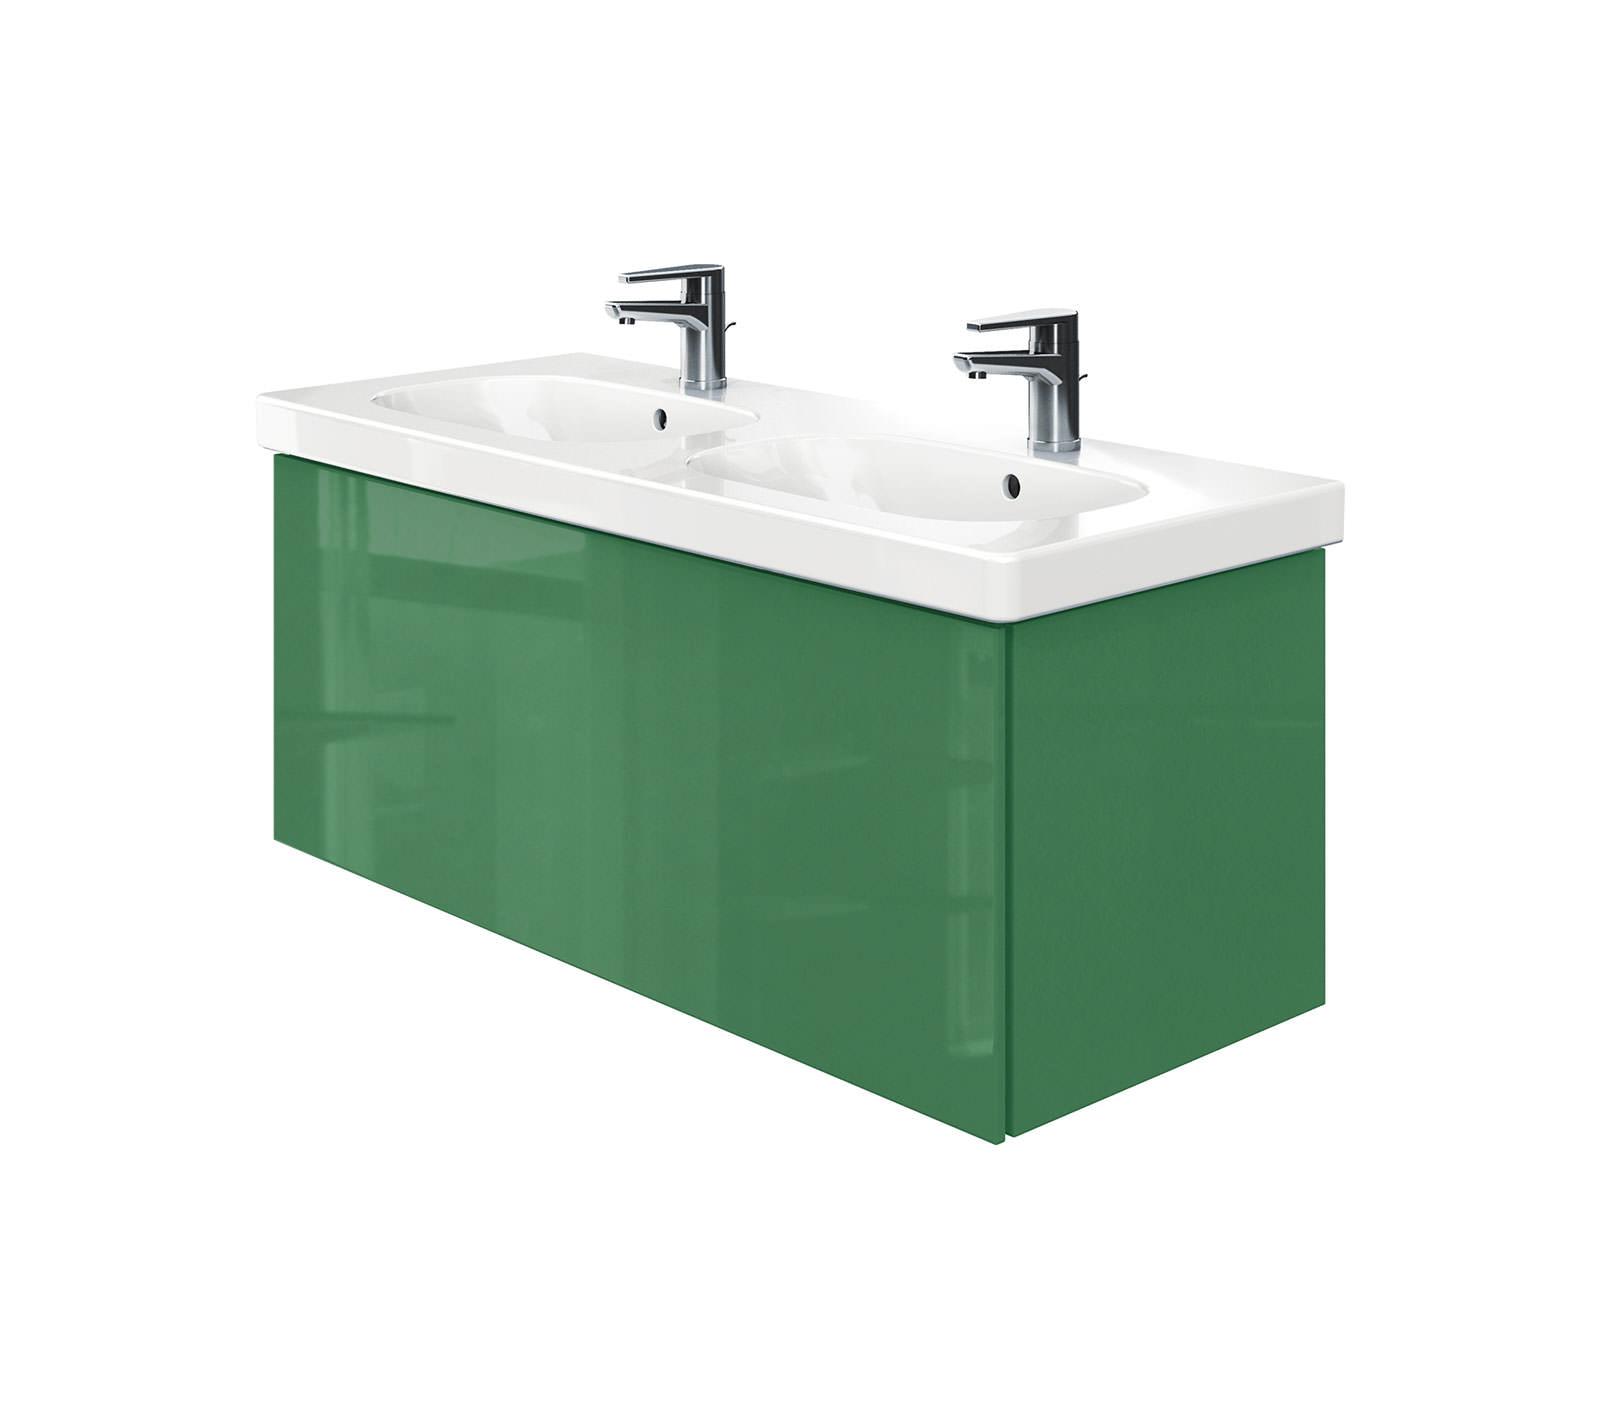 Duravit delos 1 compartment unit with d code 1200mm basin - Duravit bathroom furniture uk ...